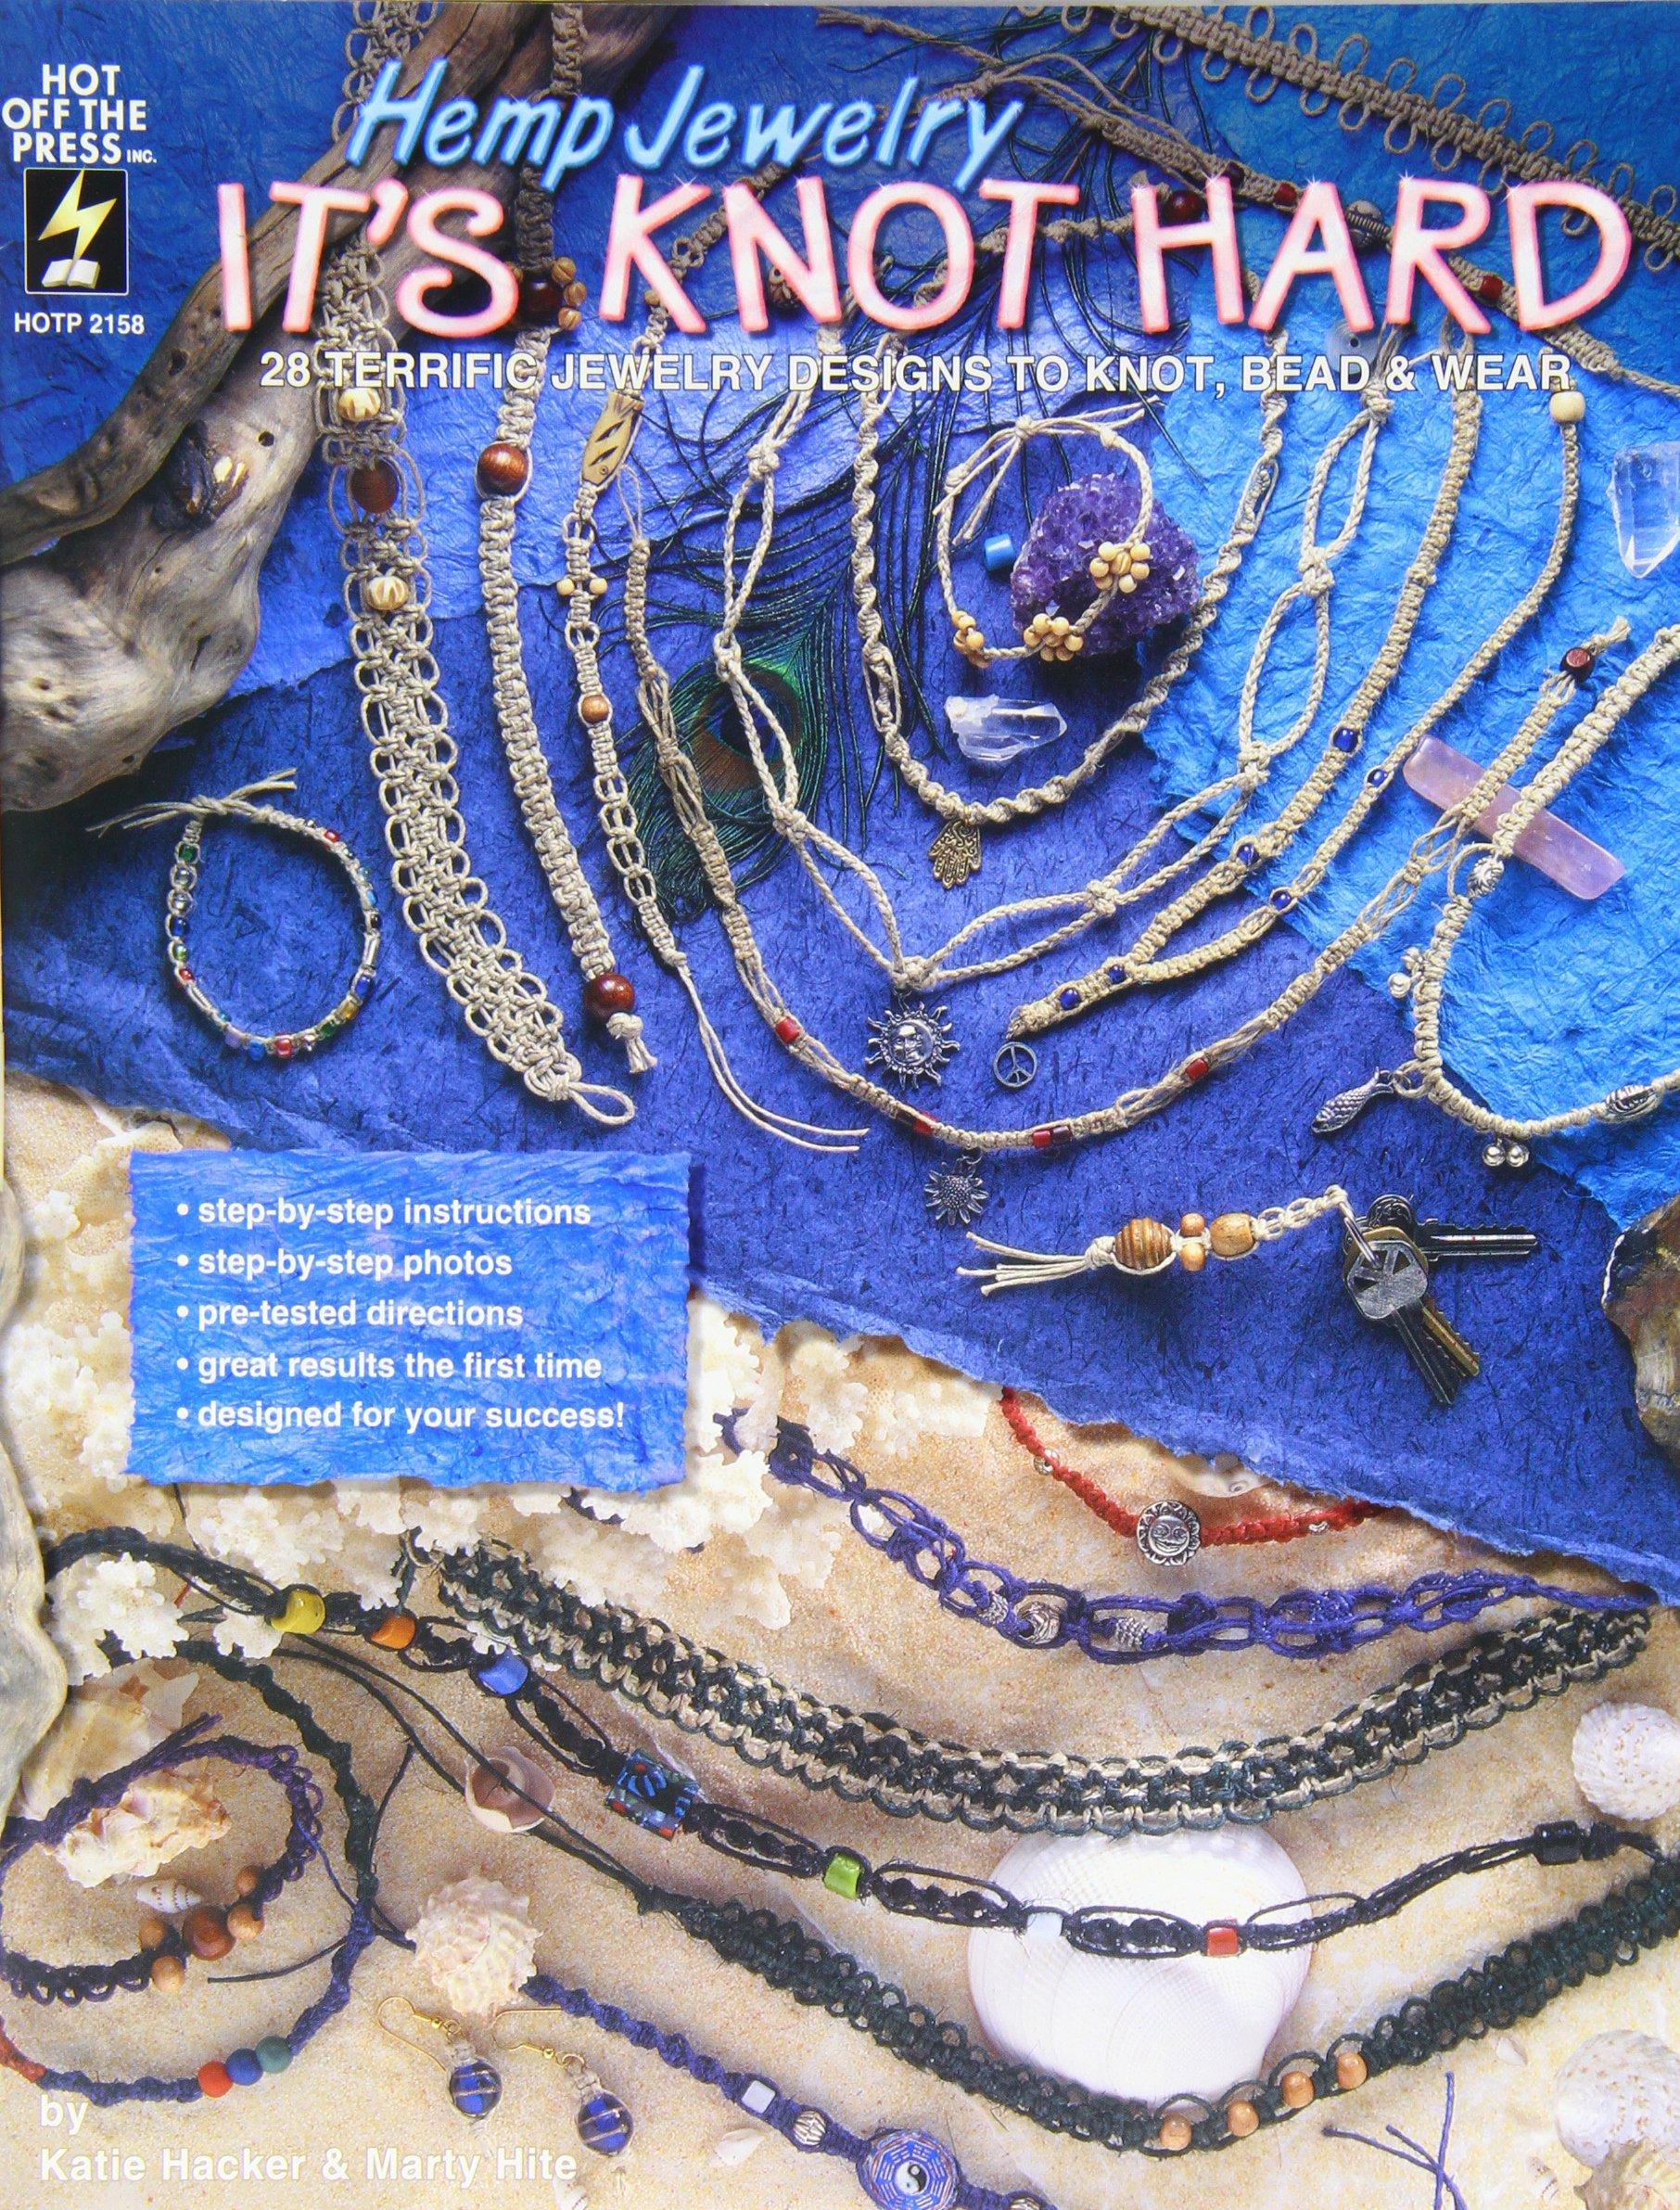 Hemp Jewelry It's Knot Hard: 28 Terrific Jewelry Designs to Knot, Bead & Wear by Hot Off The Press